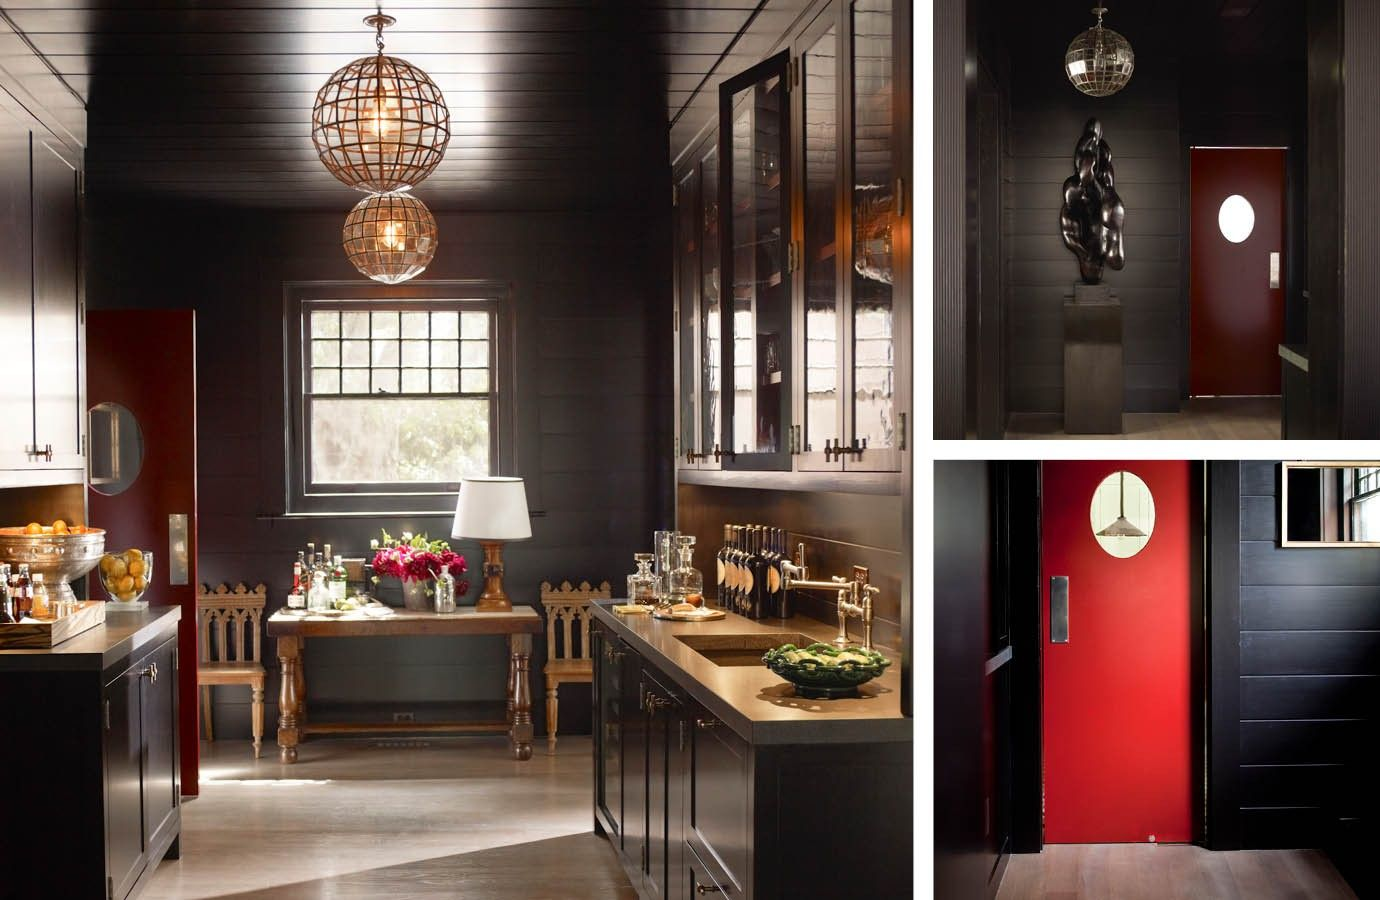 s r gambrel kitchen design beautiful kitchens black kitchens on r kitchen cabinets id=30746